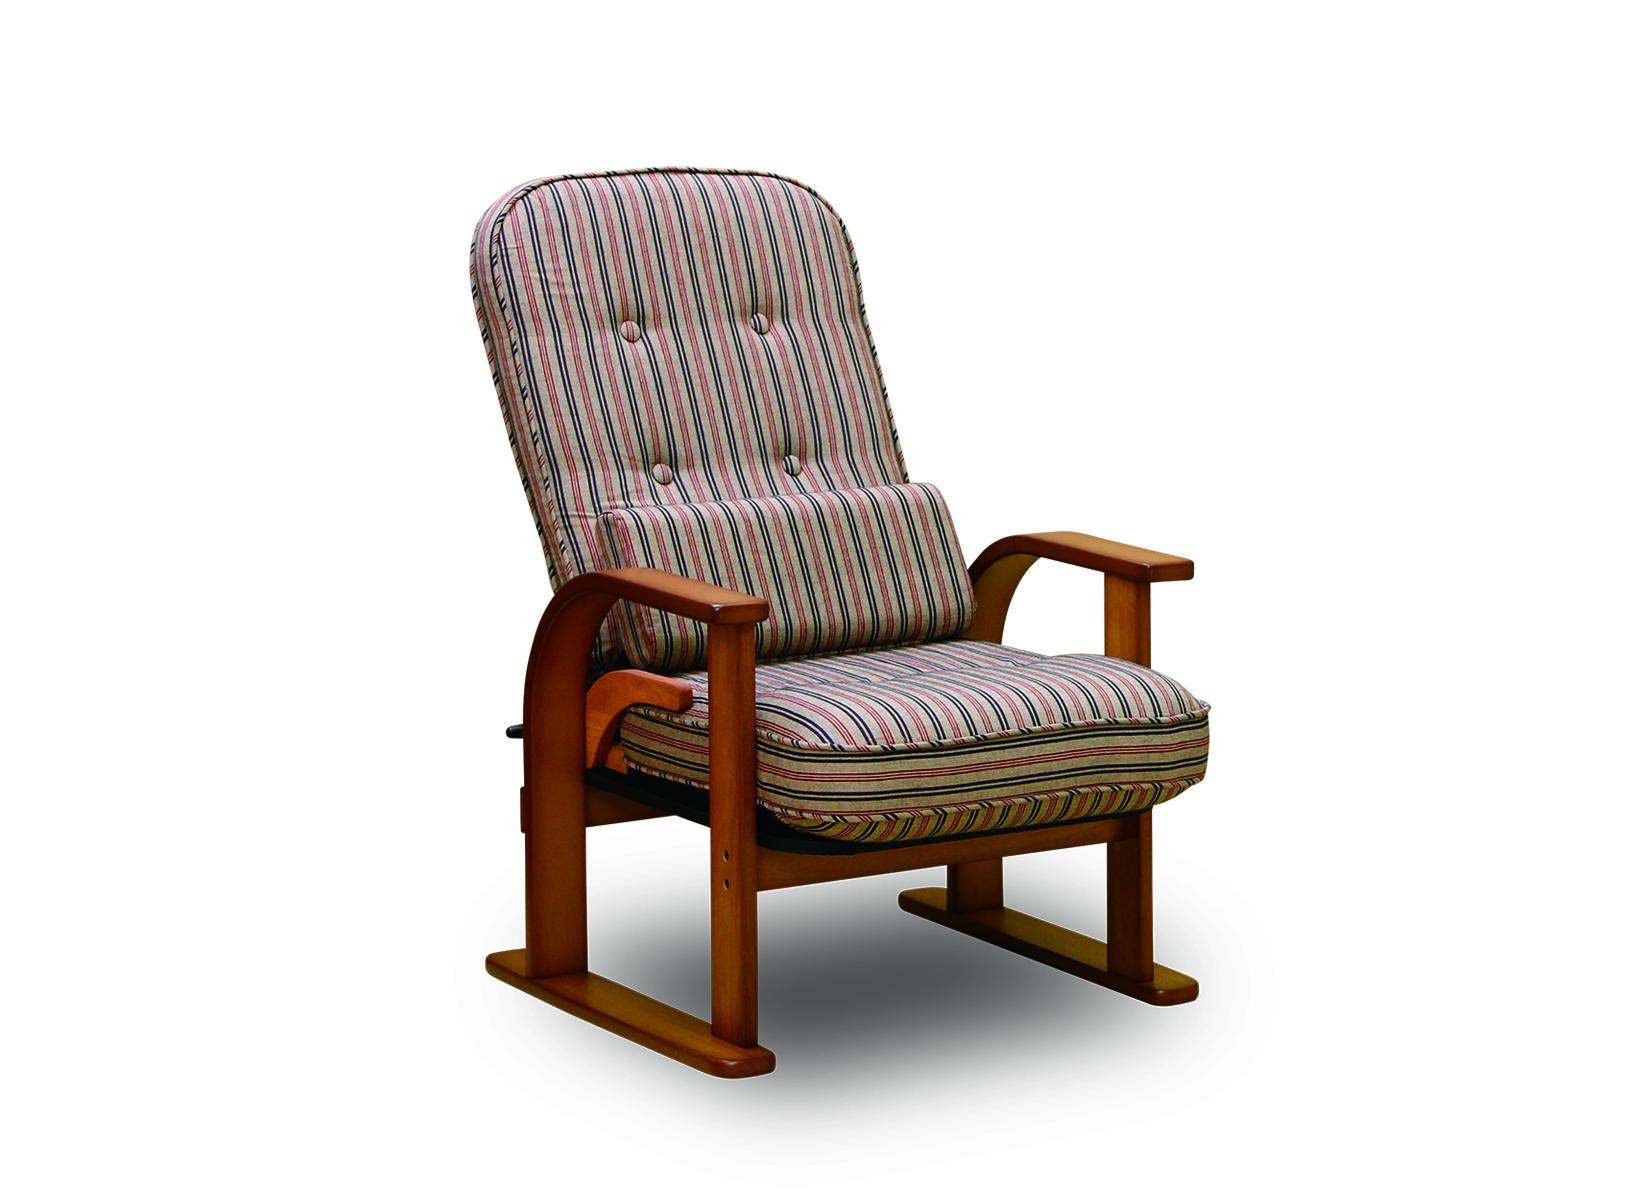 [NK-2232]肘付き高座椅子 無段階調整 ハイタイプ